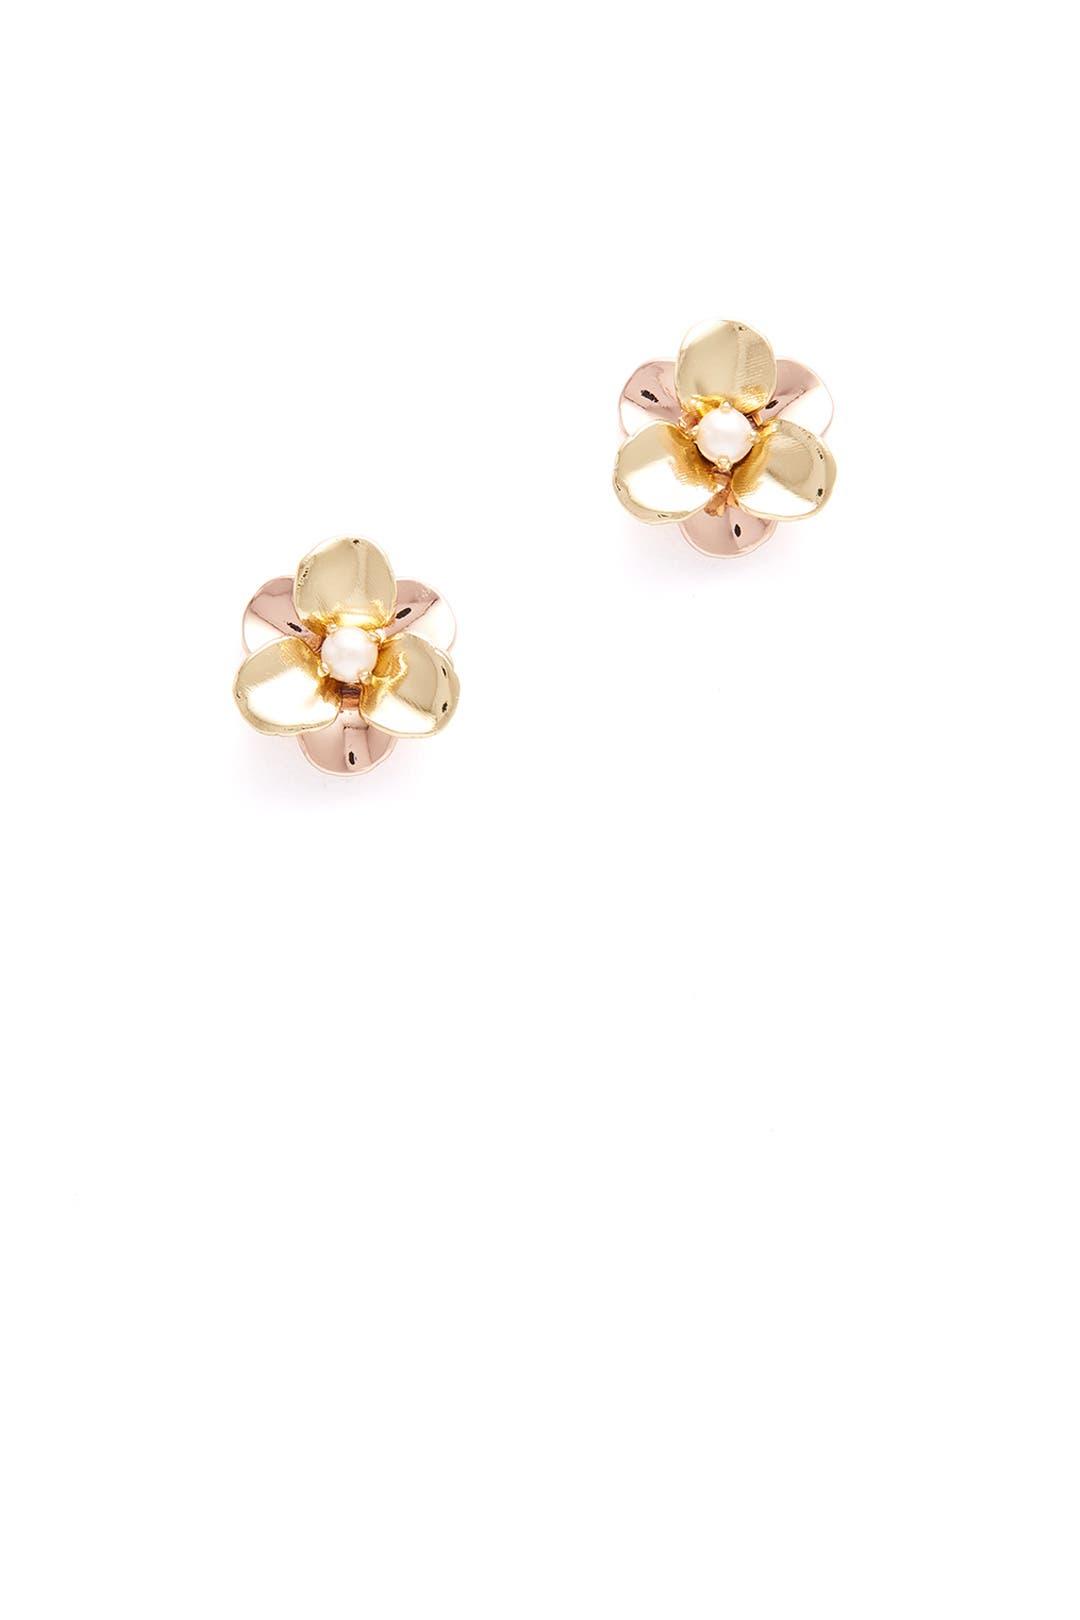 7427c9c99f0b7 kate spade new york accessories Pick a Posy Stud Earrings